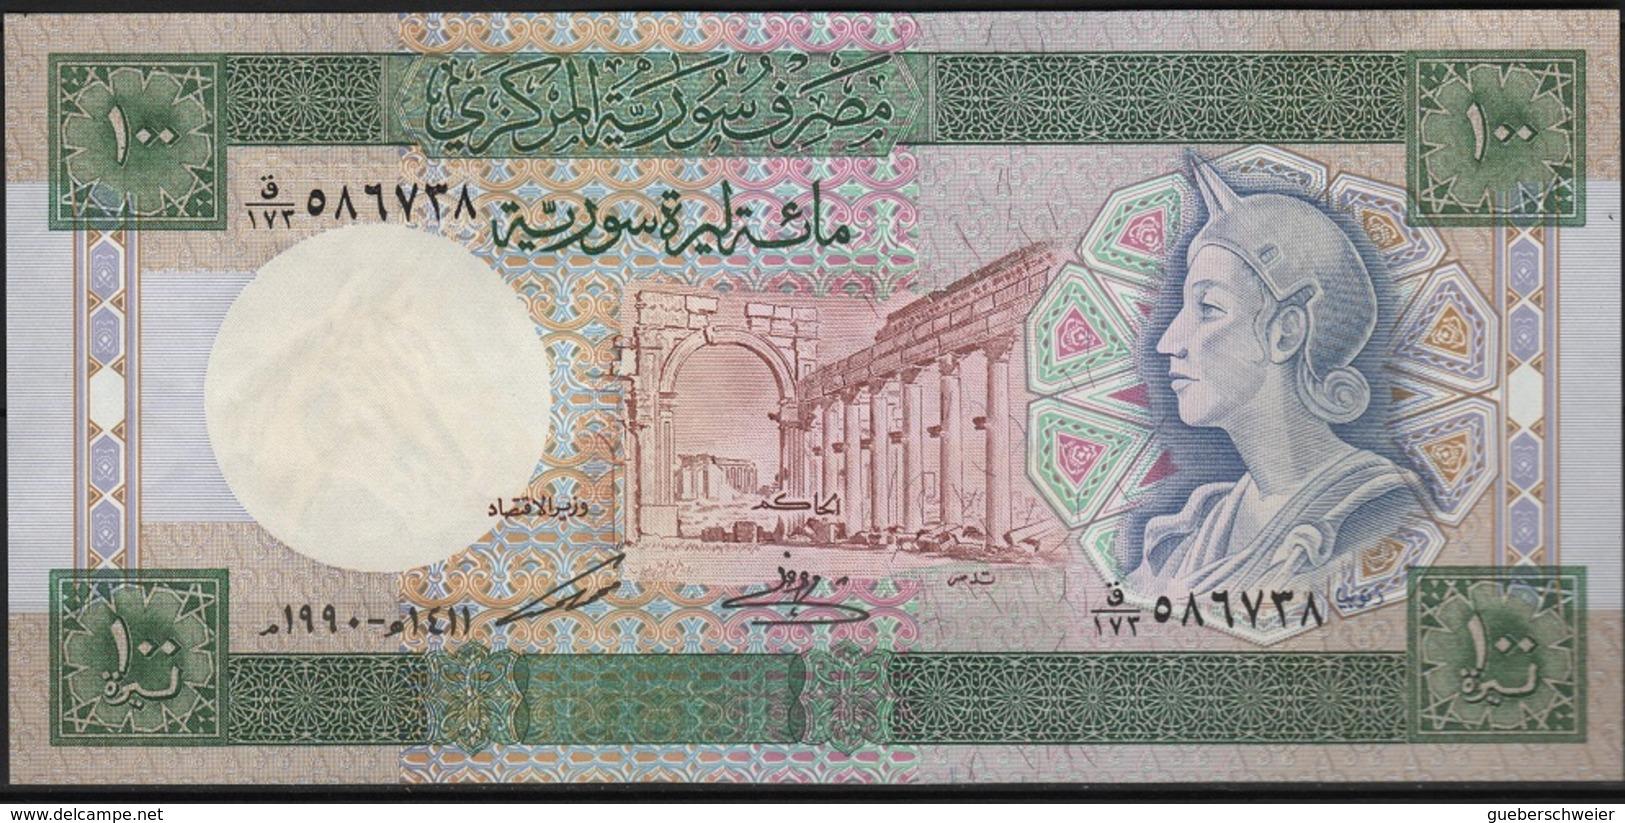 B 119 - SYRIE Billet De 100 Pounds De 1990 état Neuf 1er Choix - Syrie